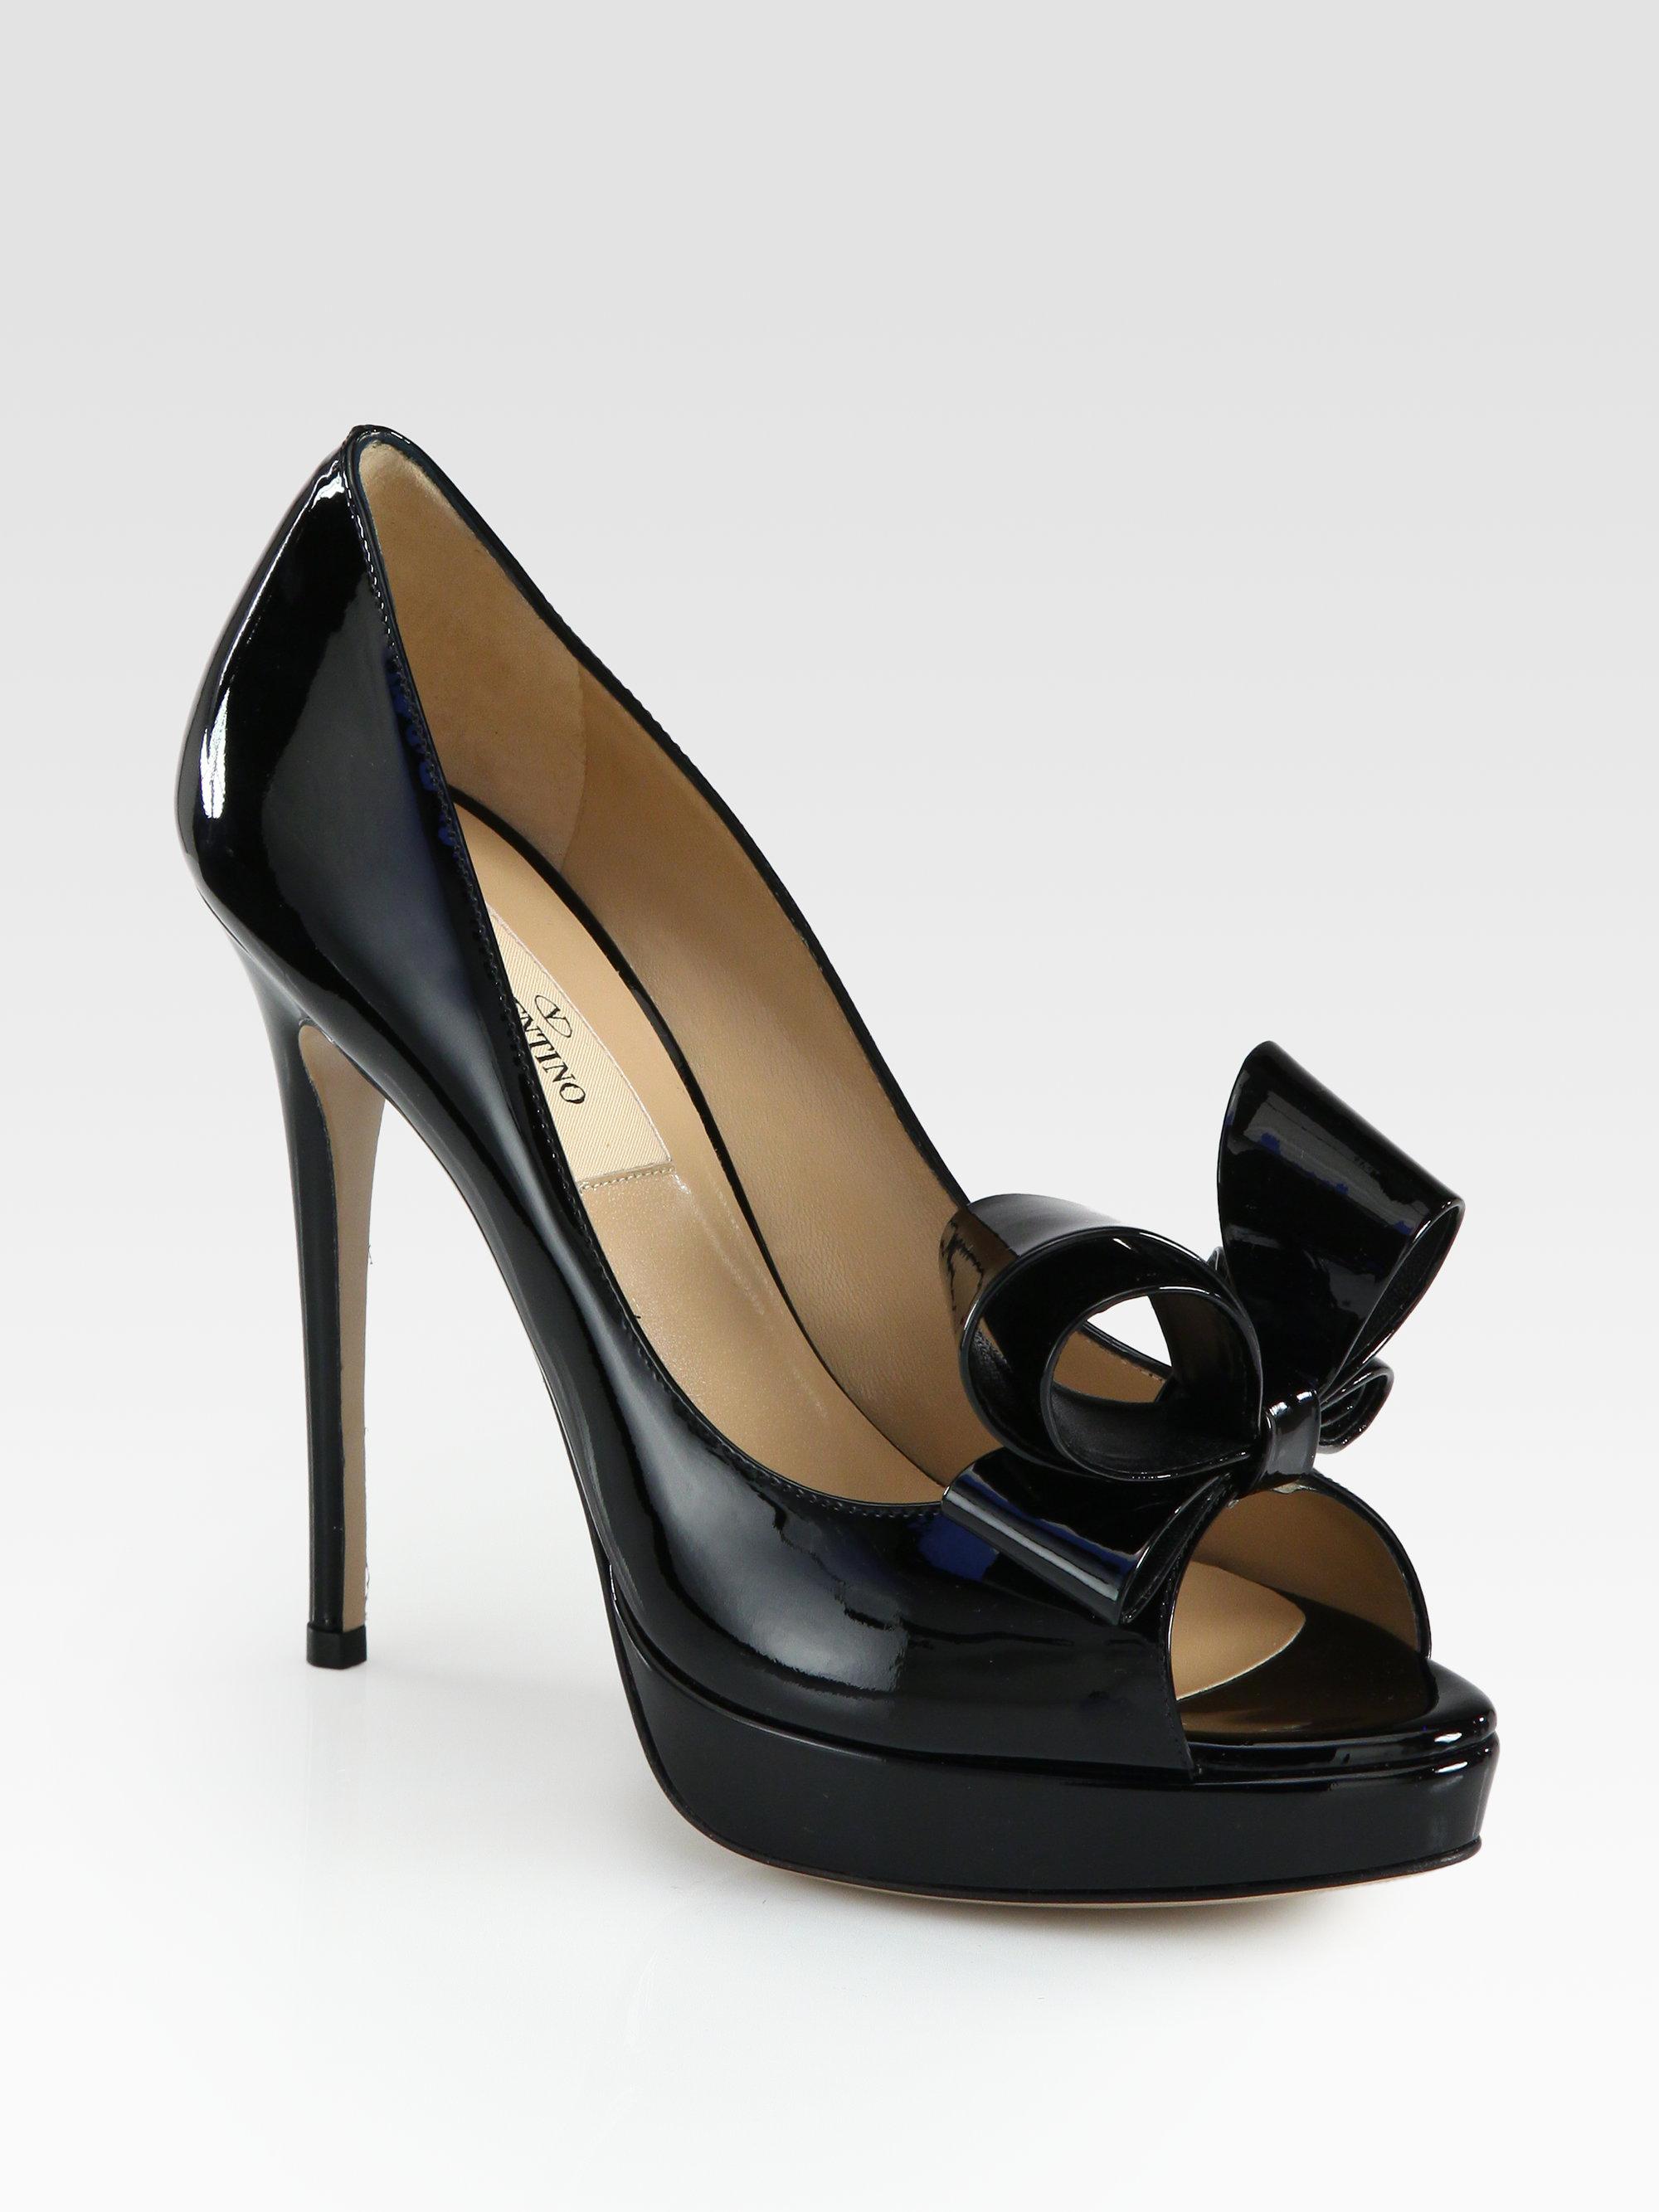 Valentino Black Bow Shoes